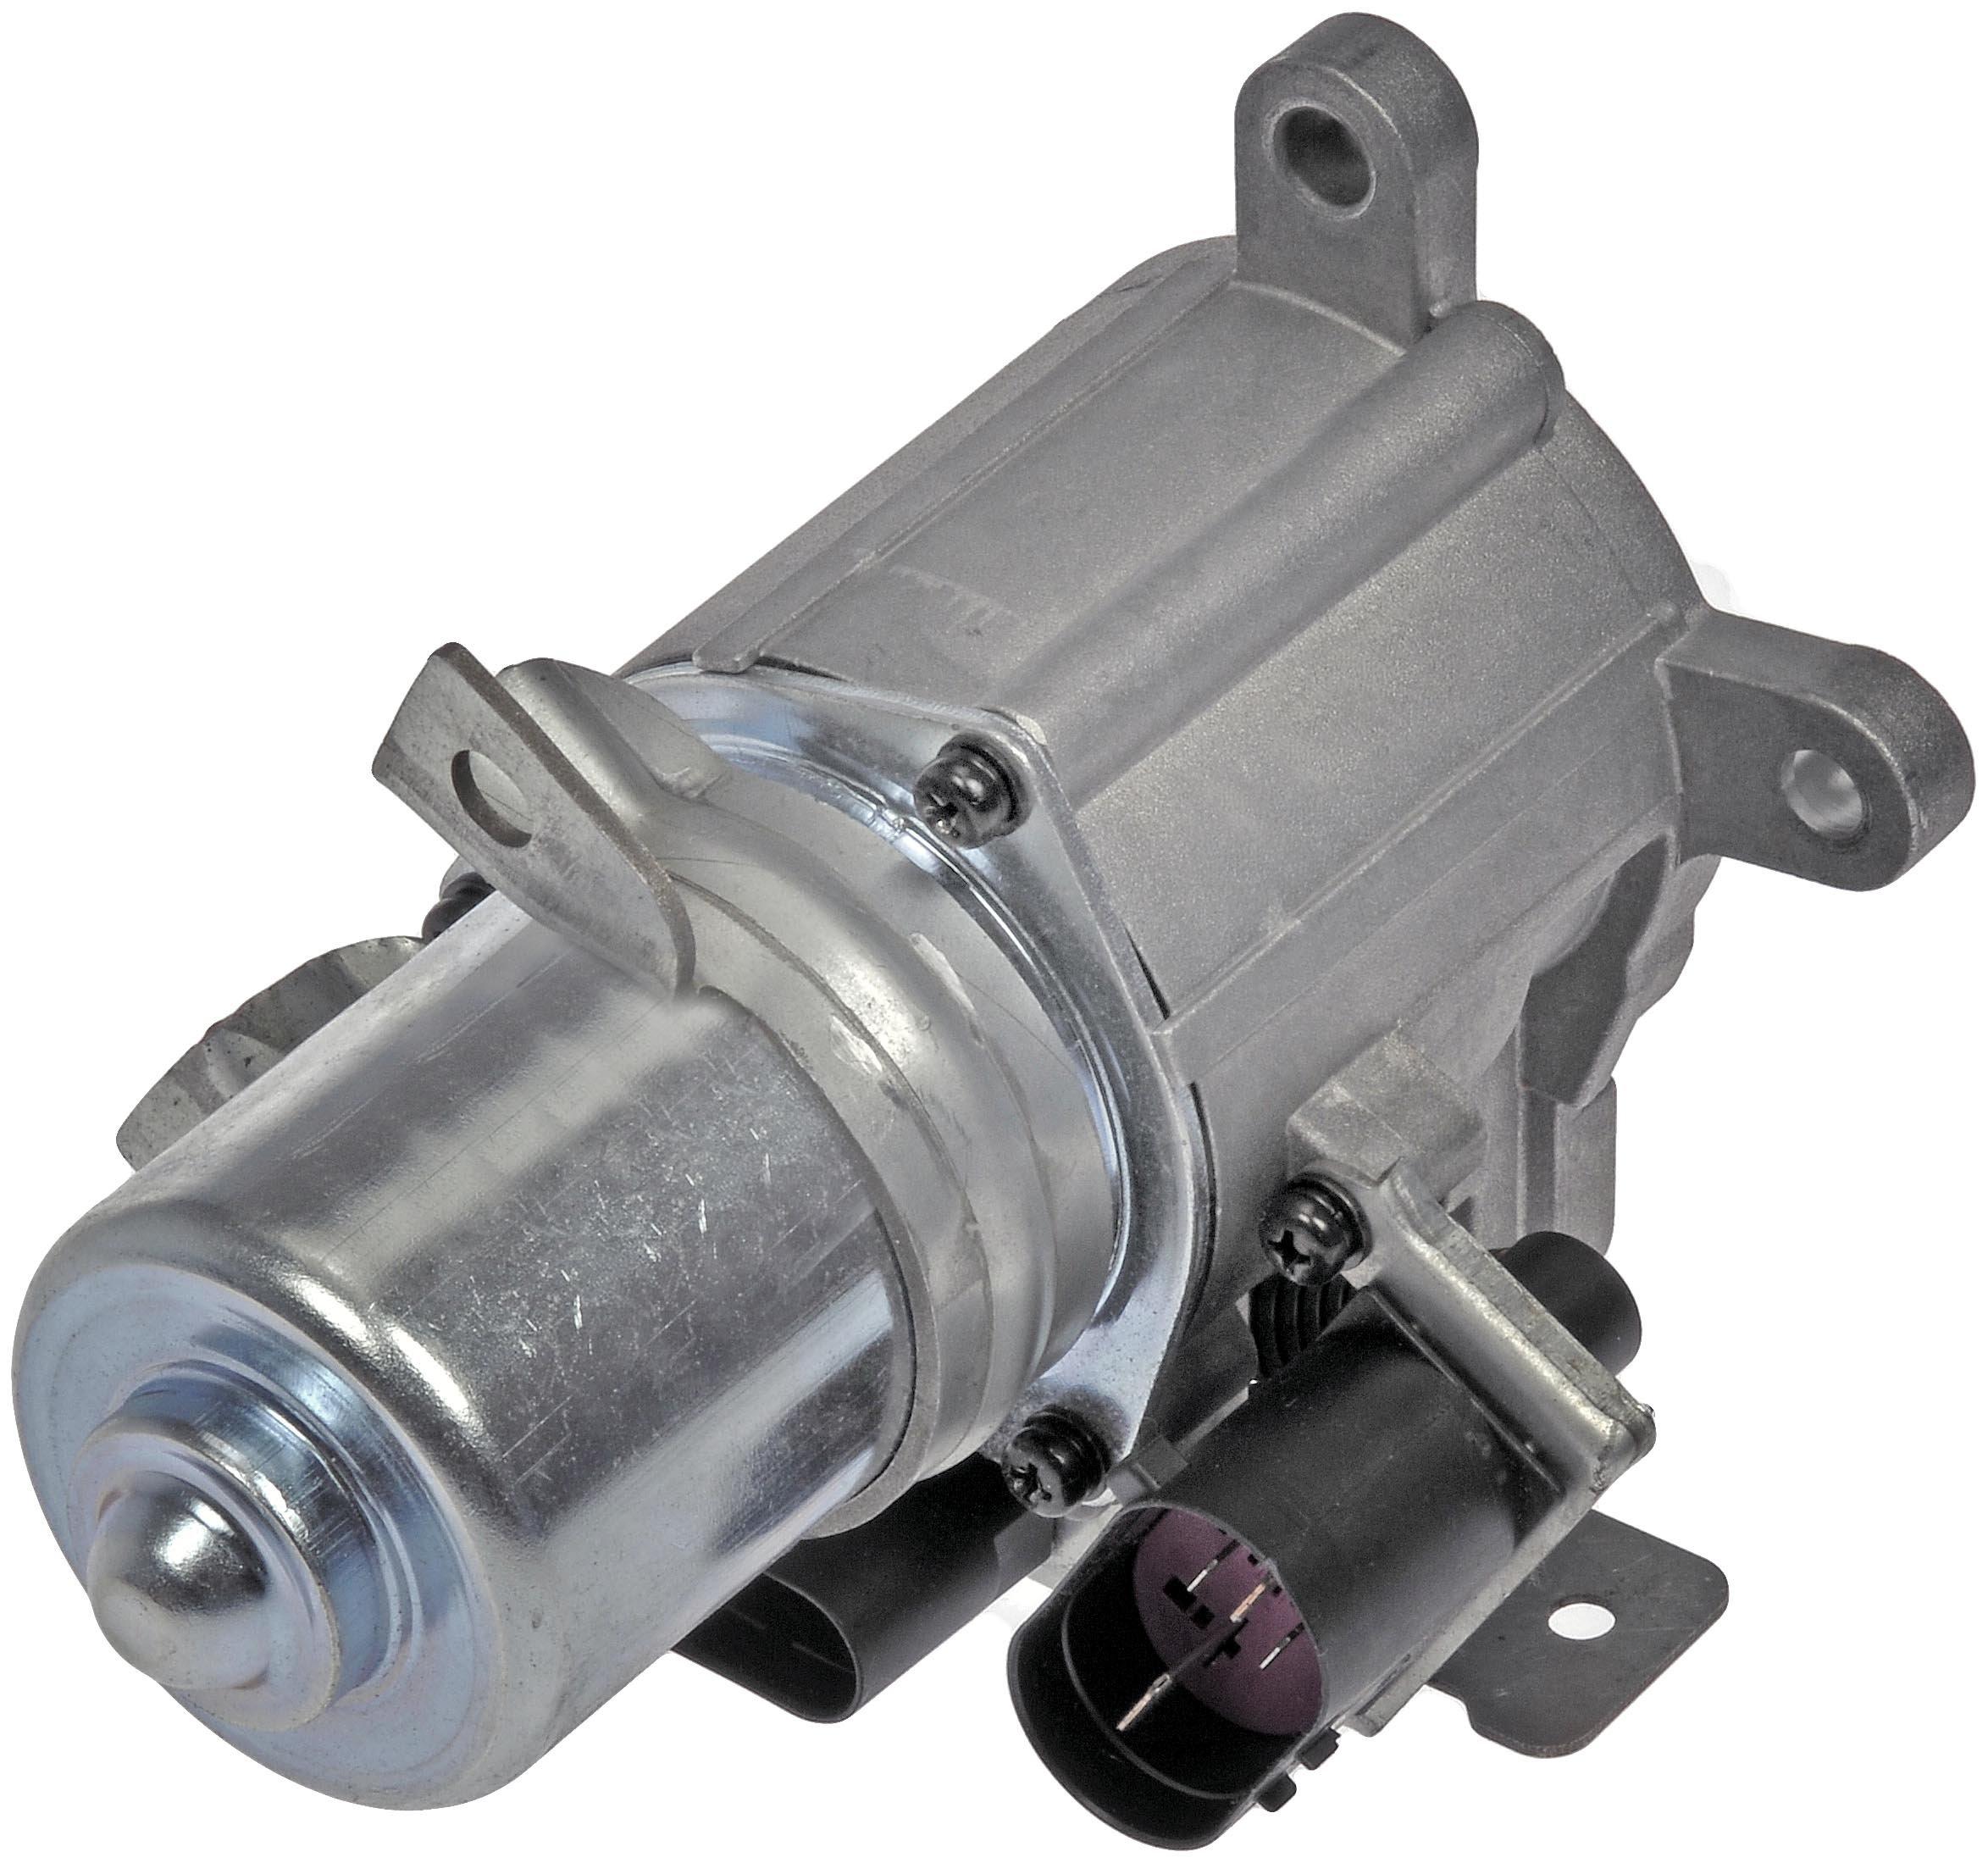 Dorman 600-970 Transfer Case Motor by Dorman